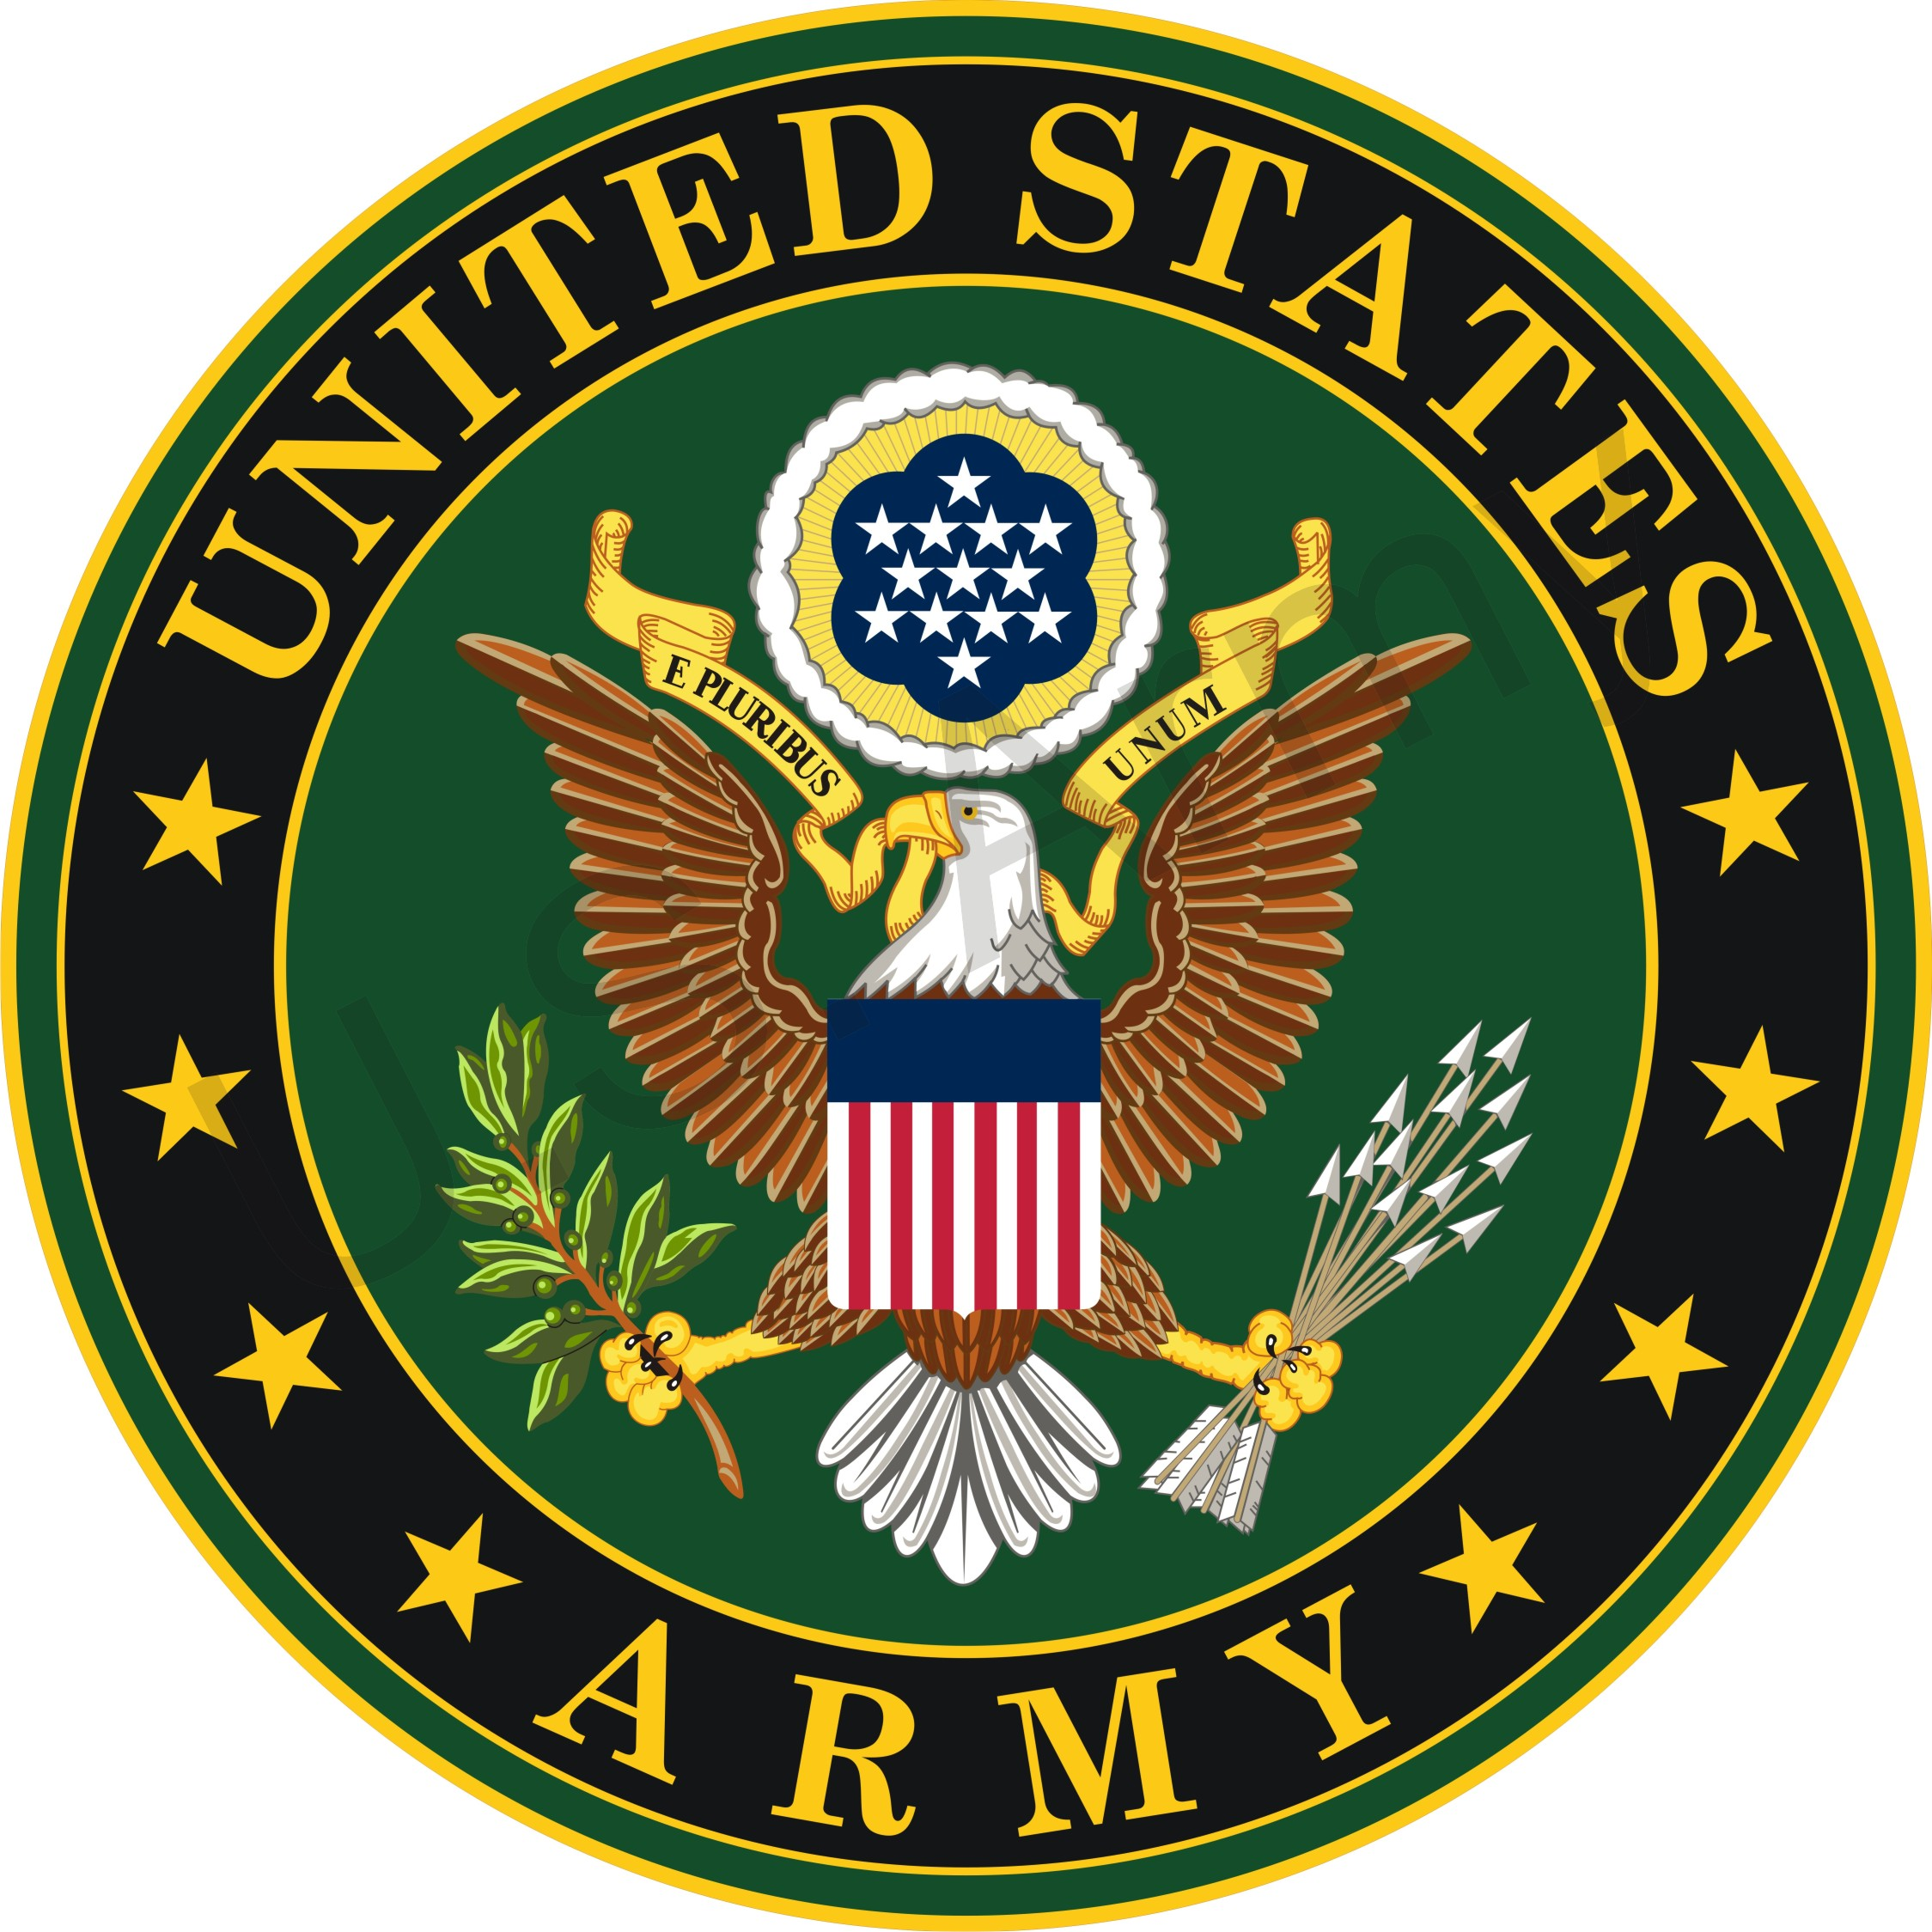 Military us army clipart .-Military us army clipart .-1